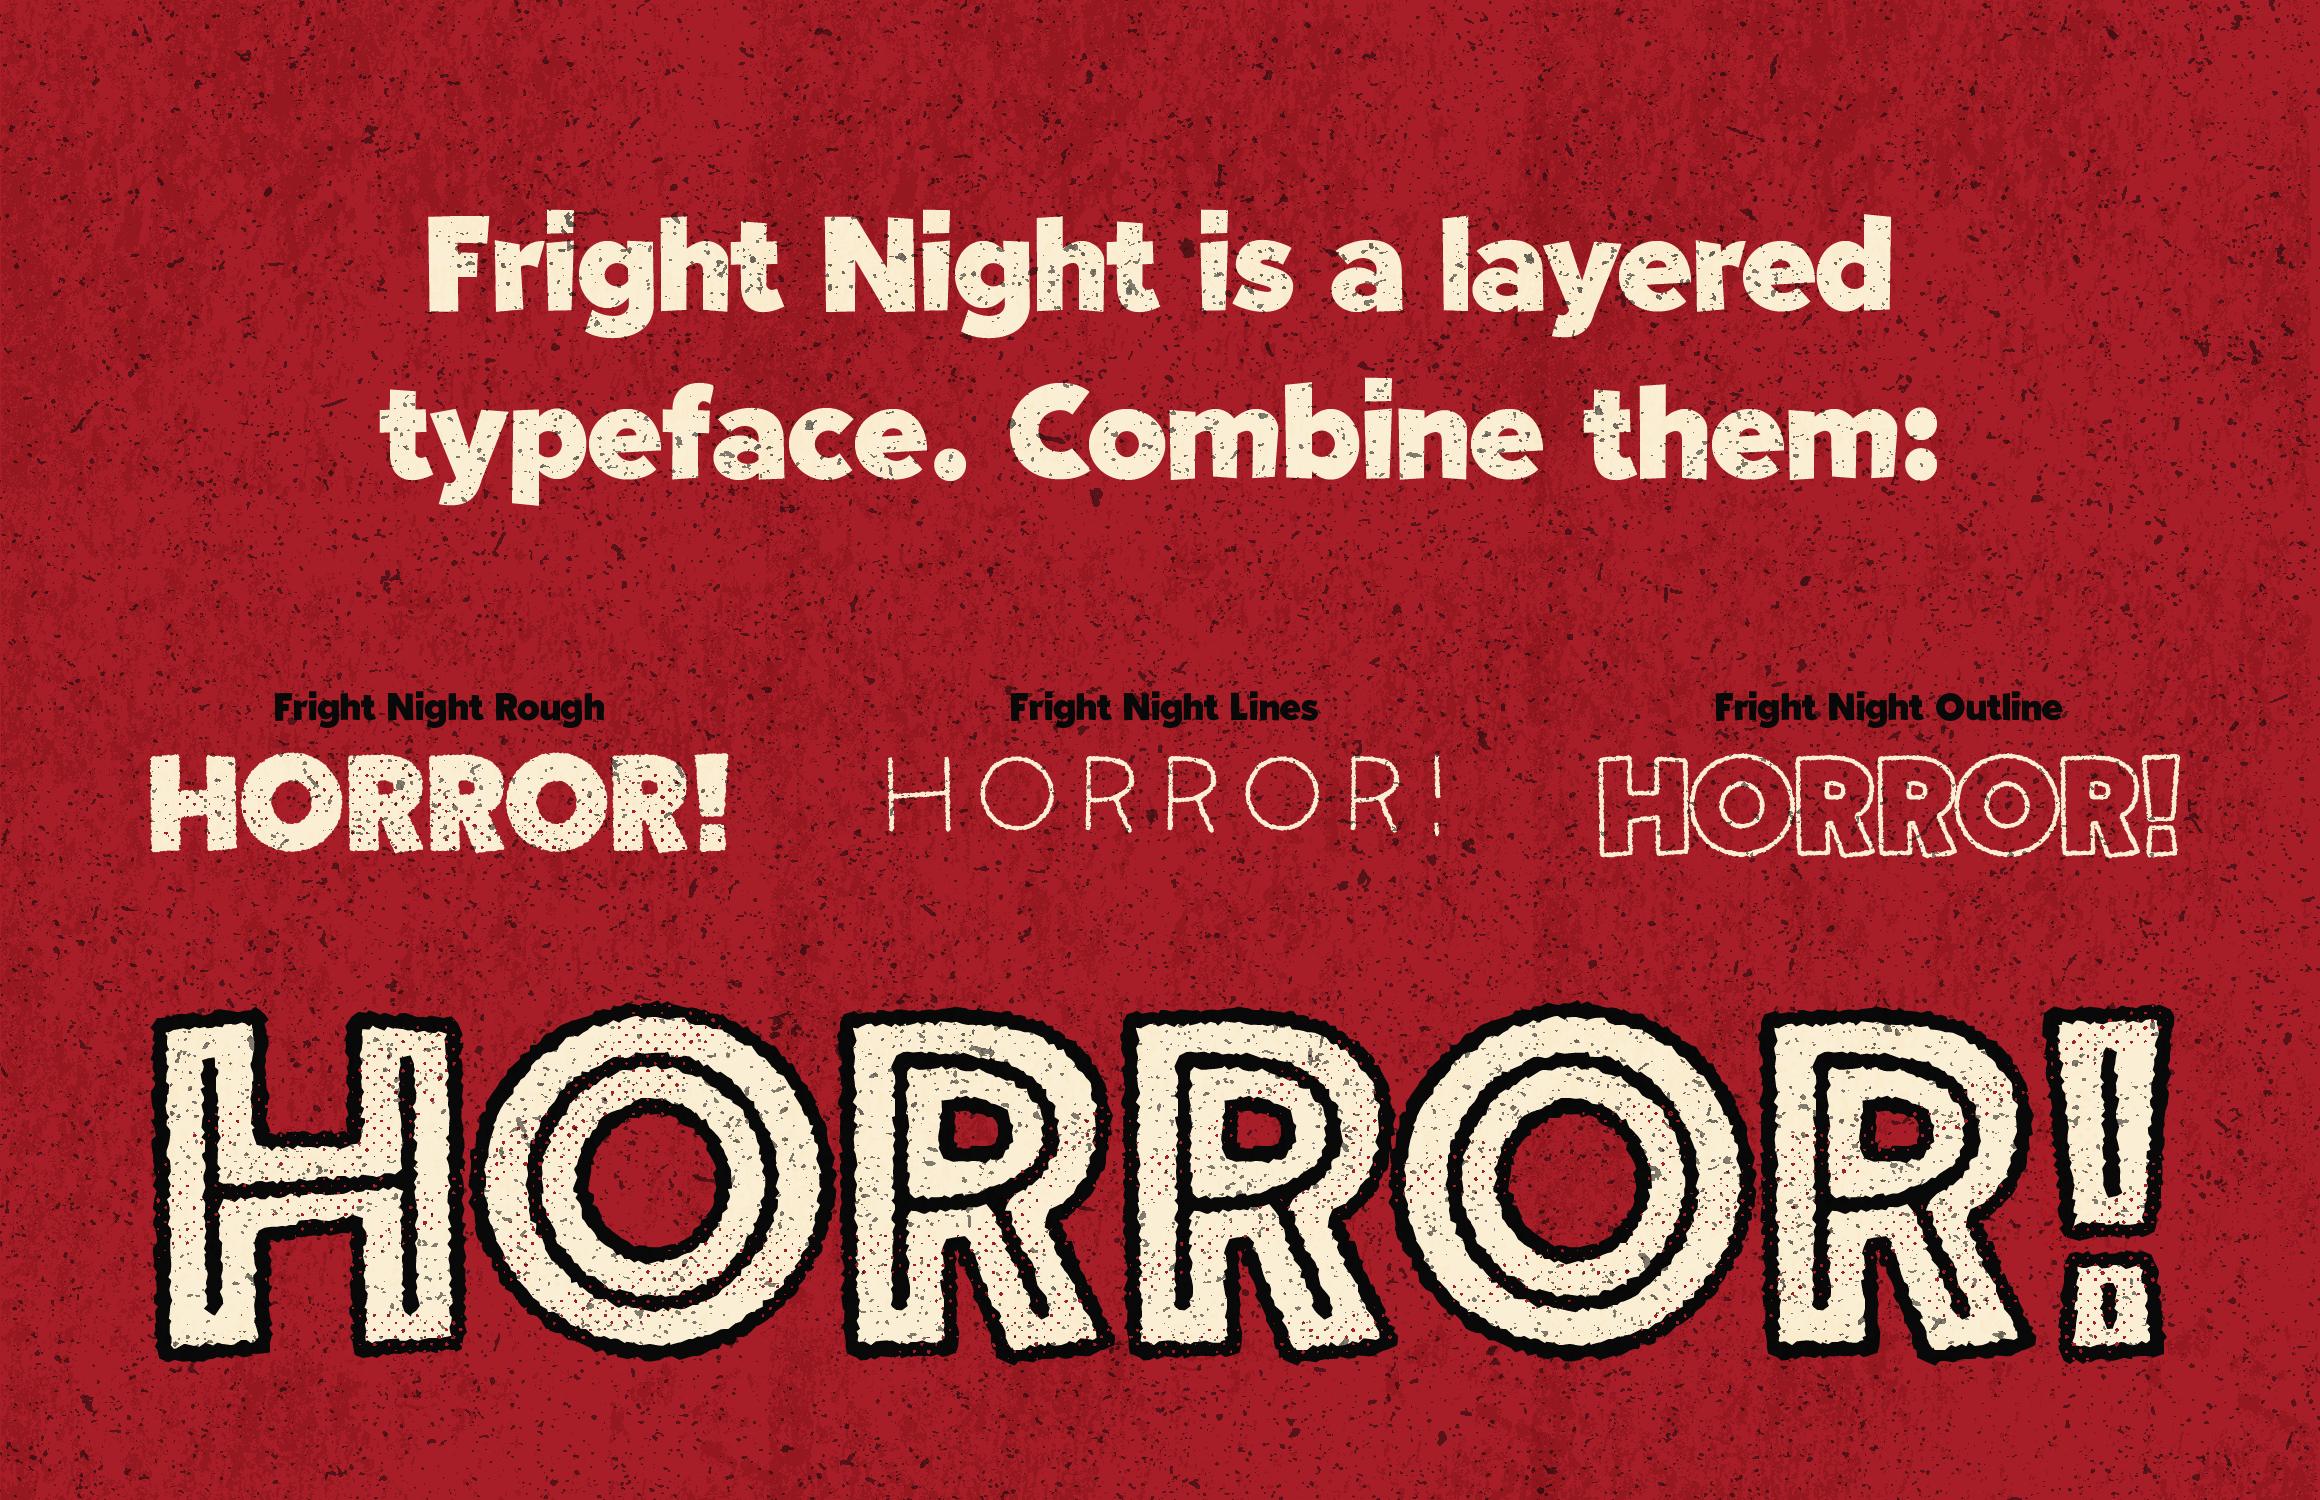 Fright Night! example image 4